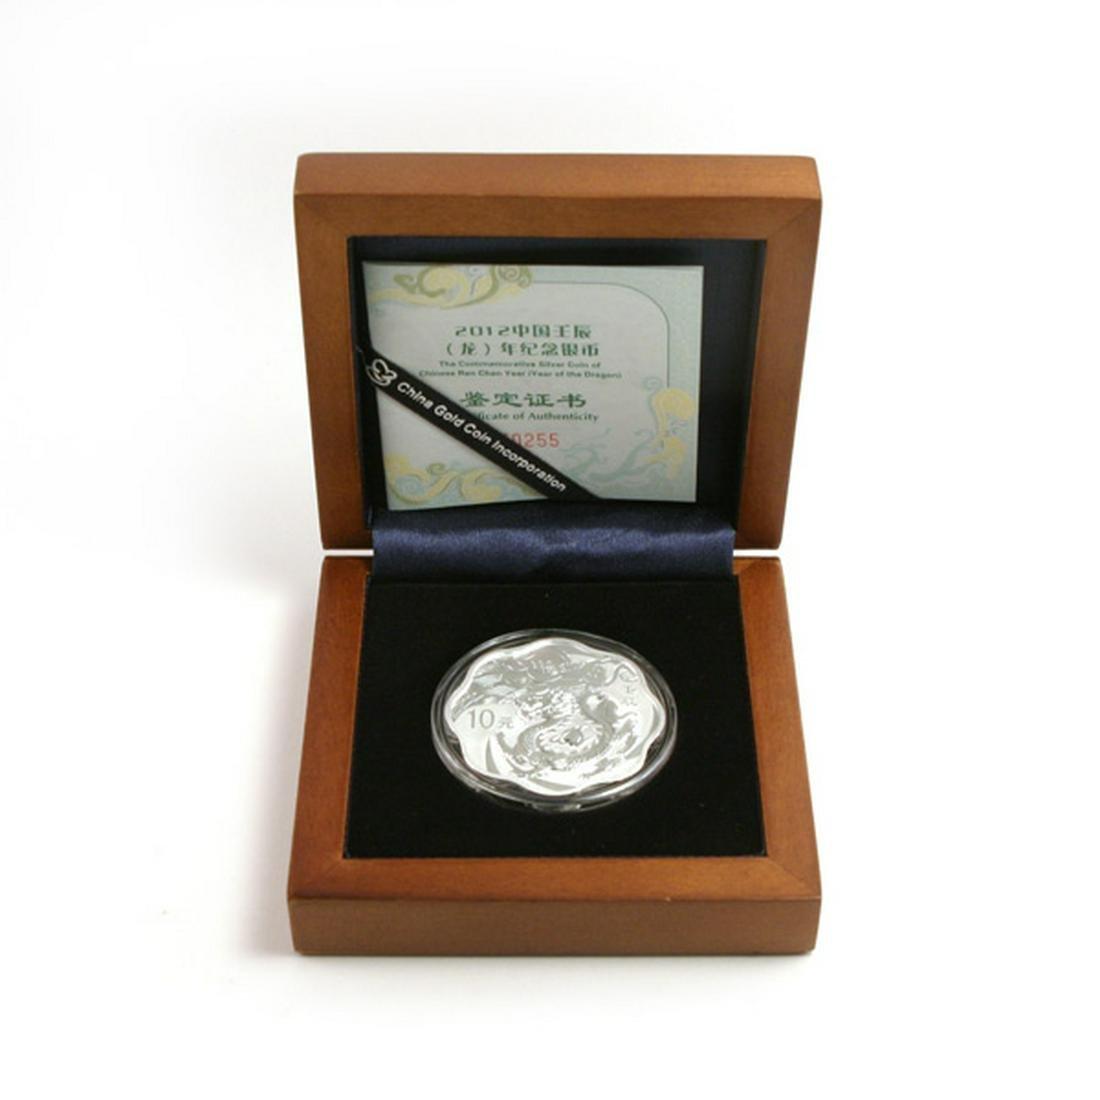 China 2012 Year of the Dragon 1 oz Silver Flower (w Box